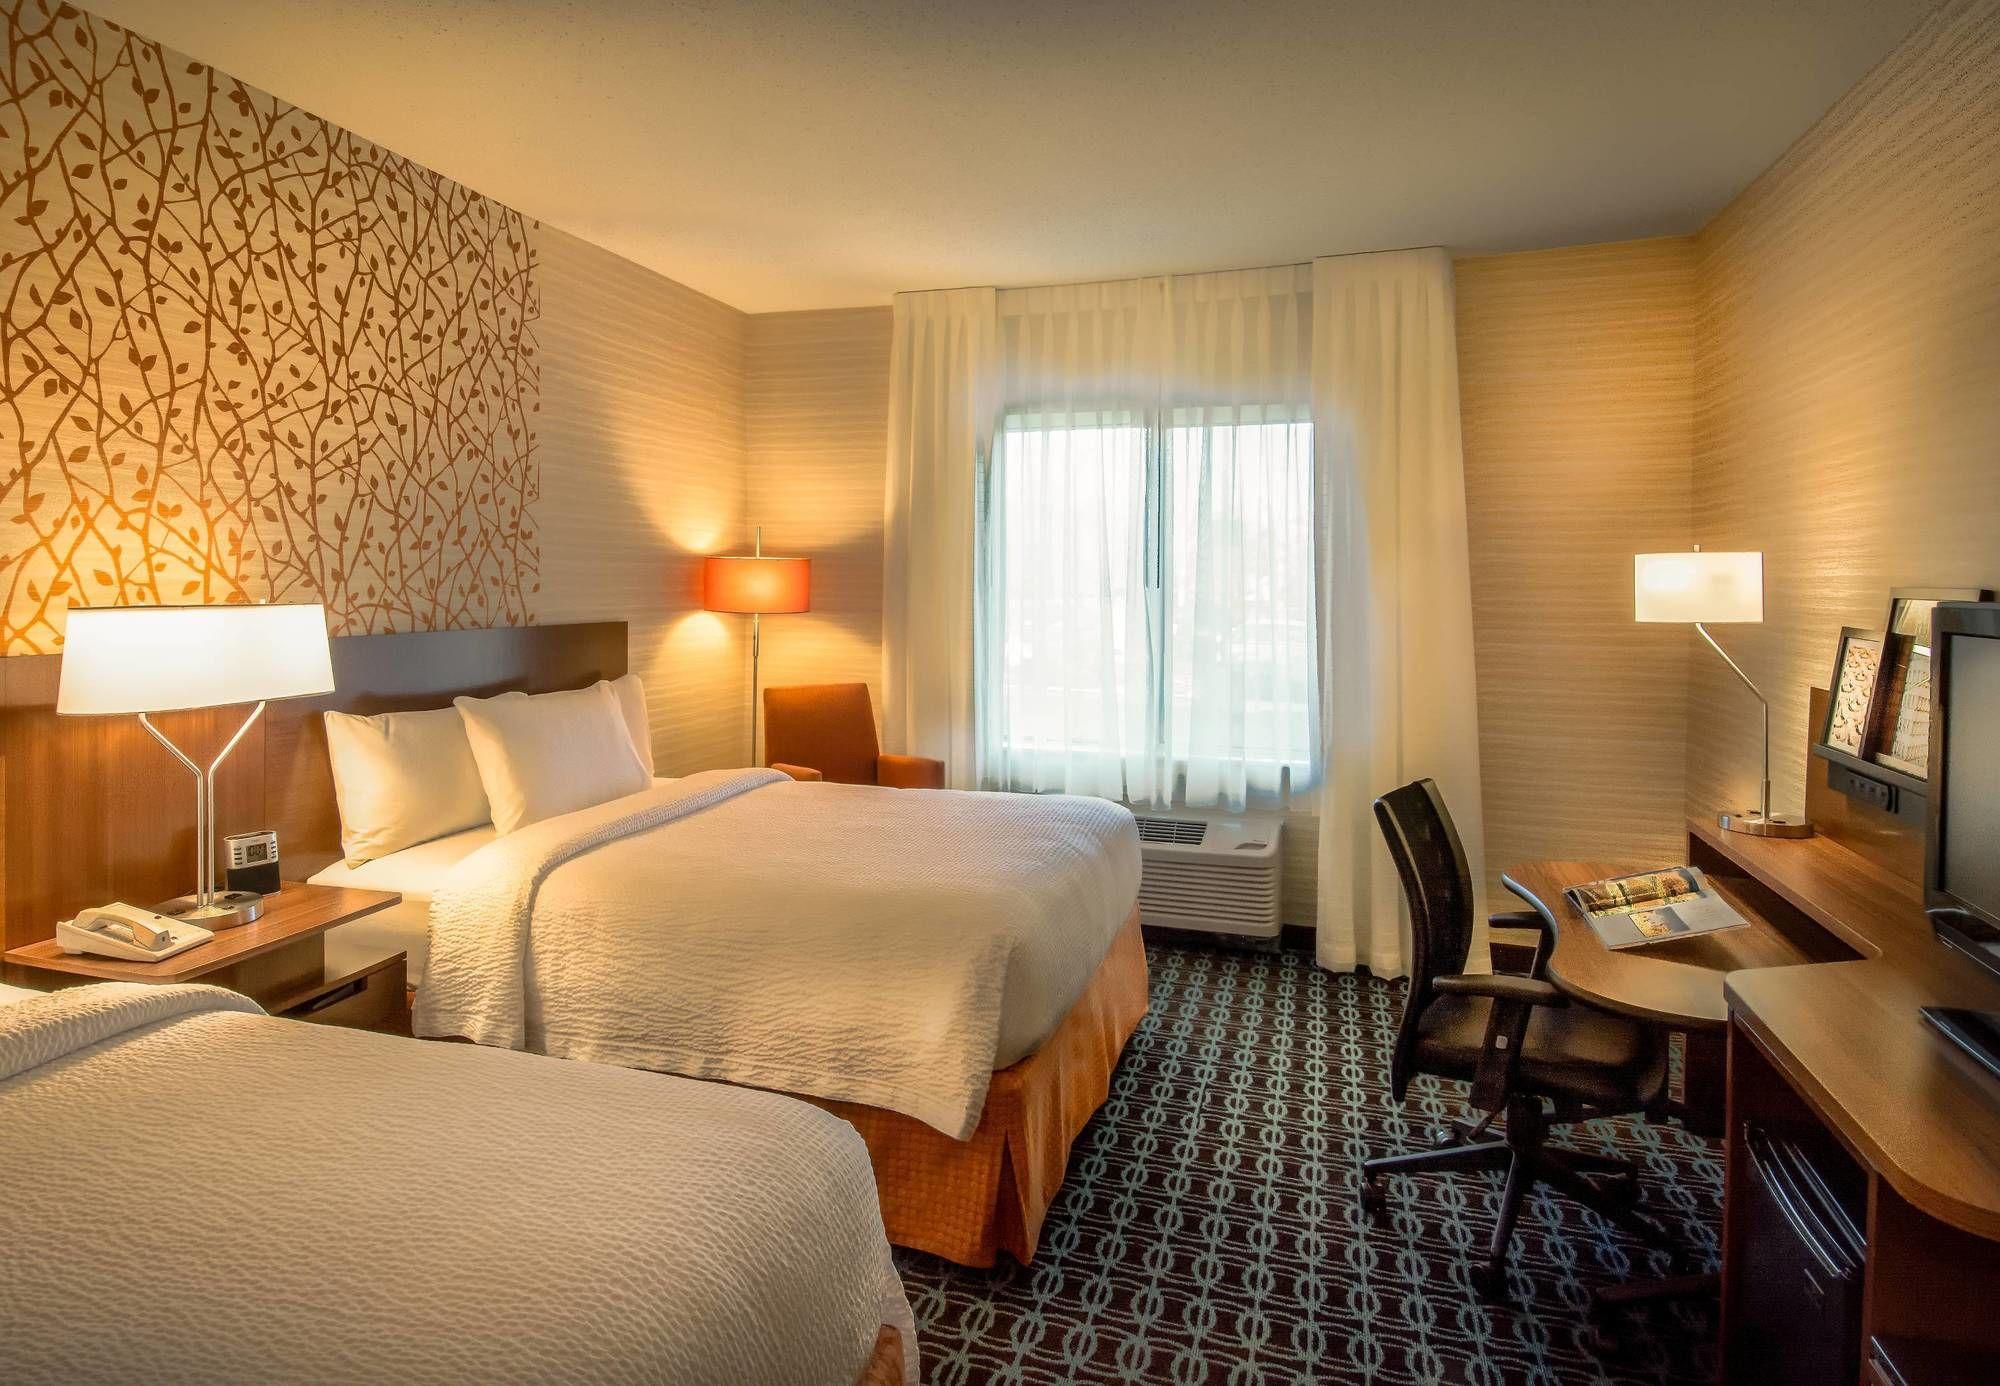 Fairfield Inn & Suites by Marriott Washington Dulles Airport